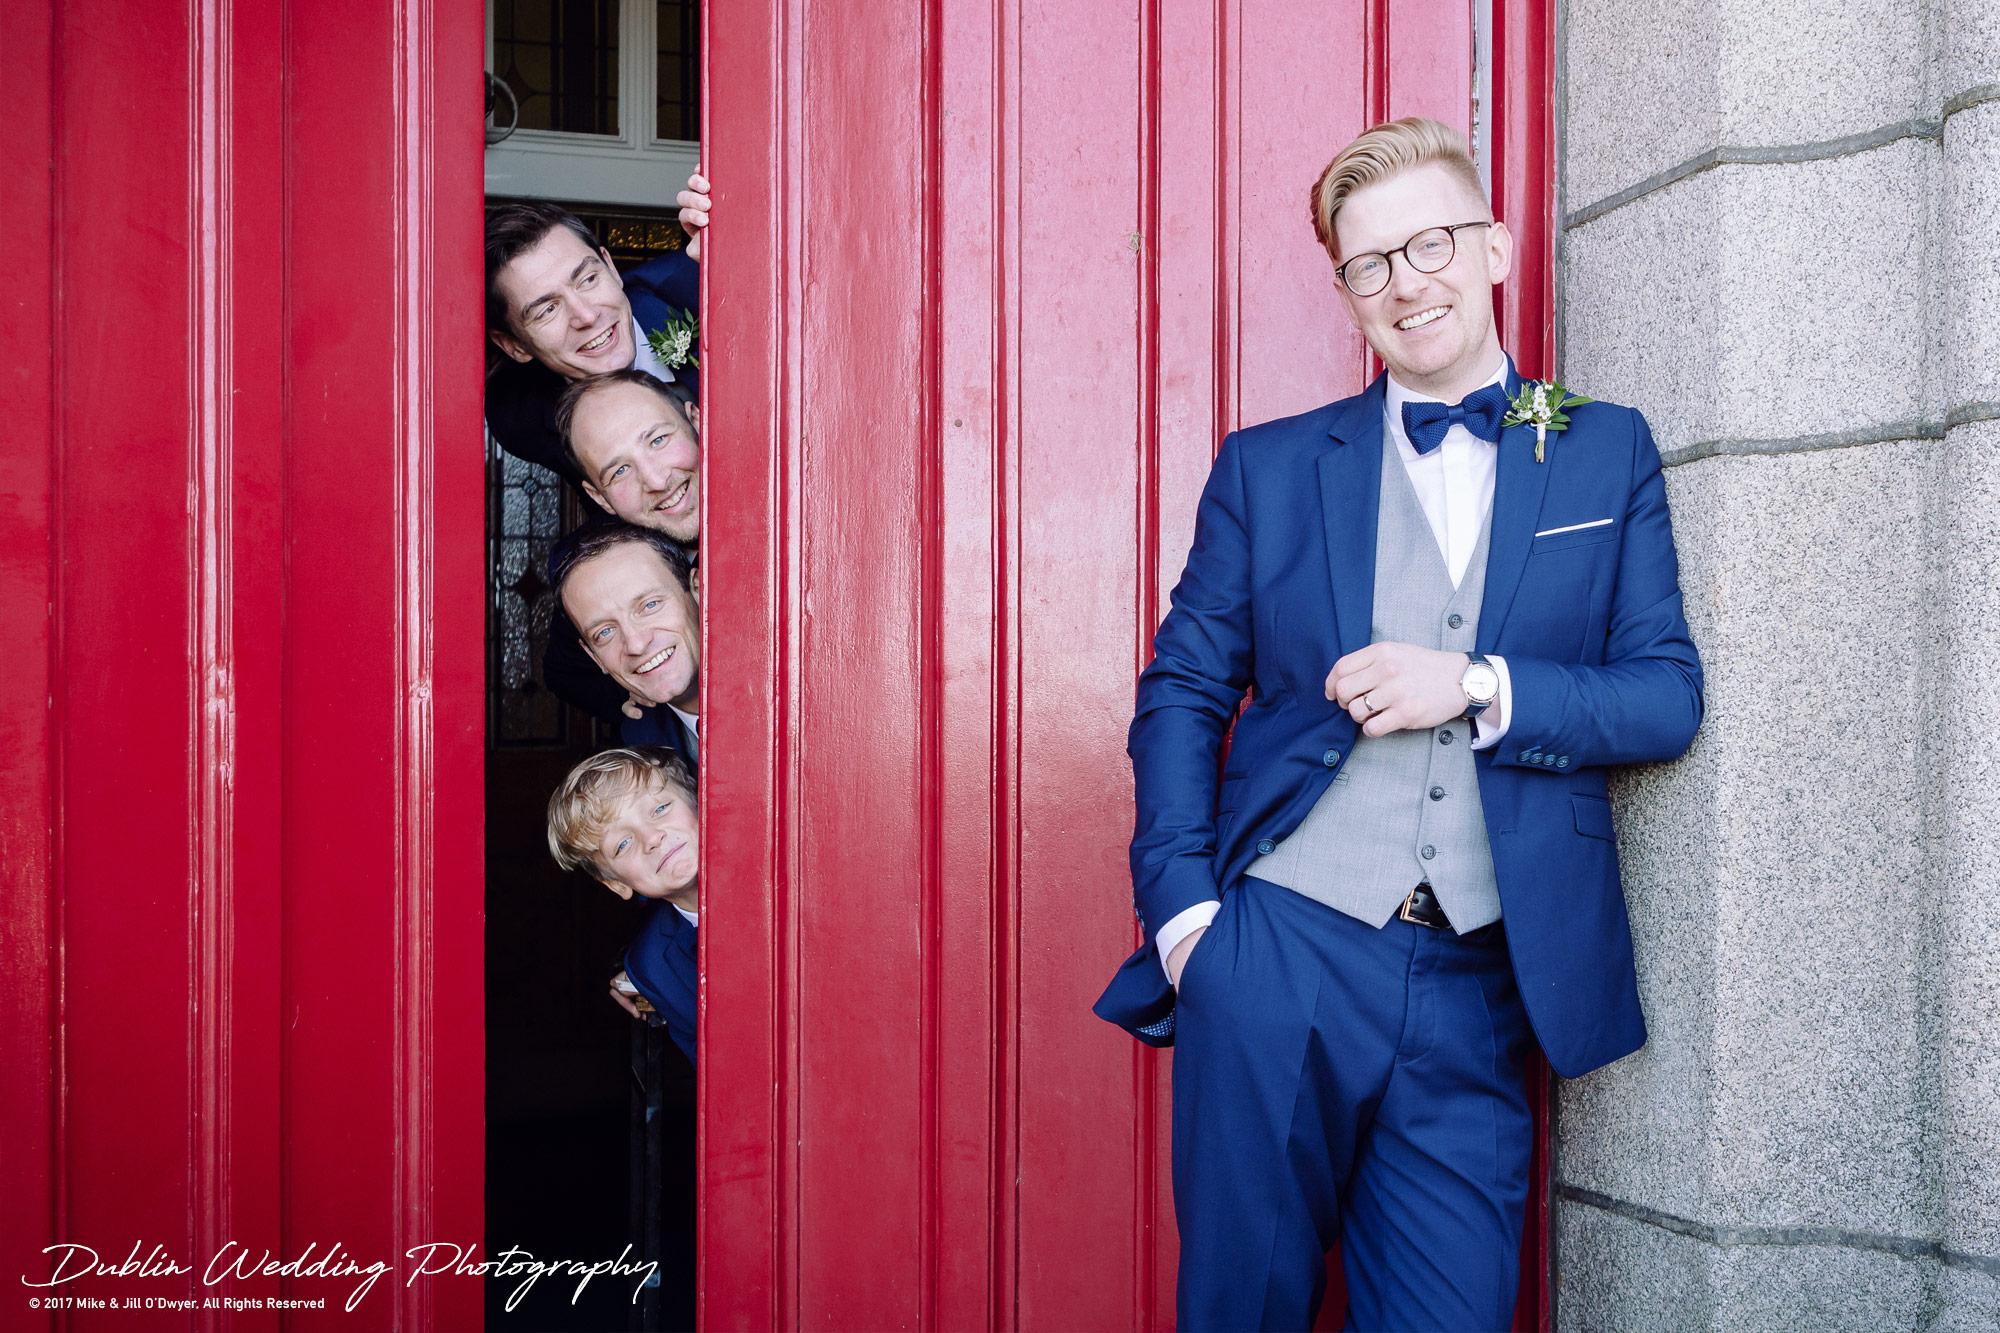 Tinakilly House Wedding Photographer: Groom and Groomsmen at Church Door